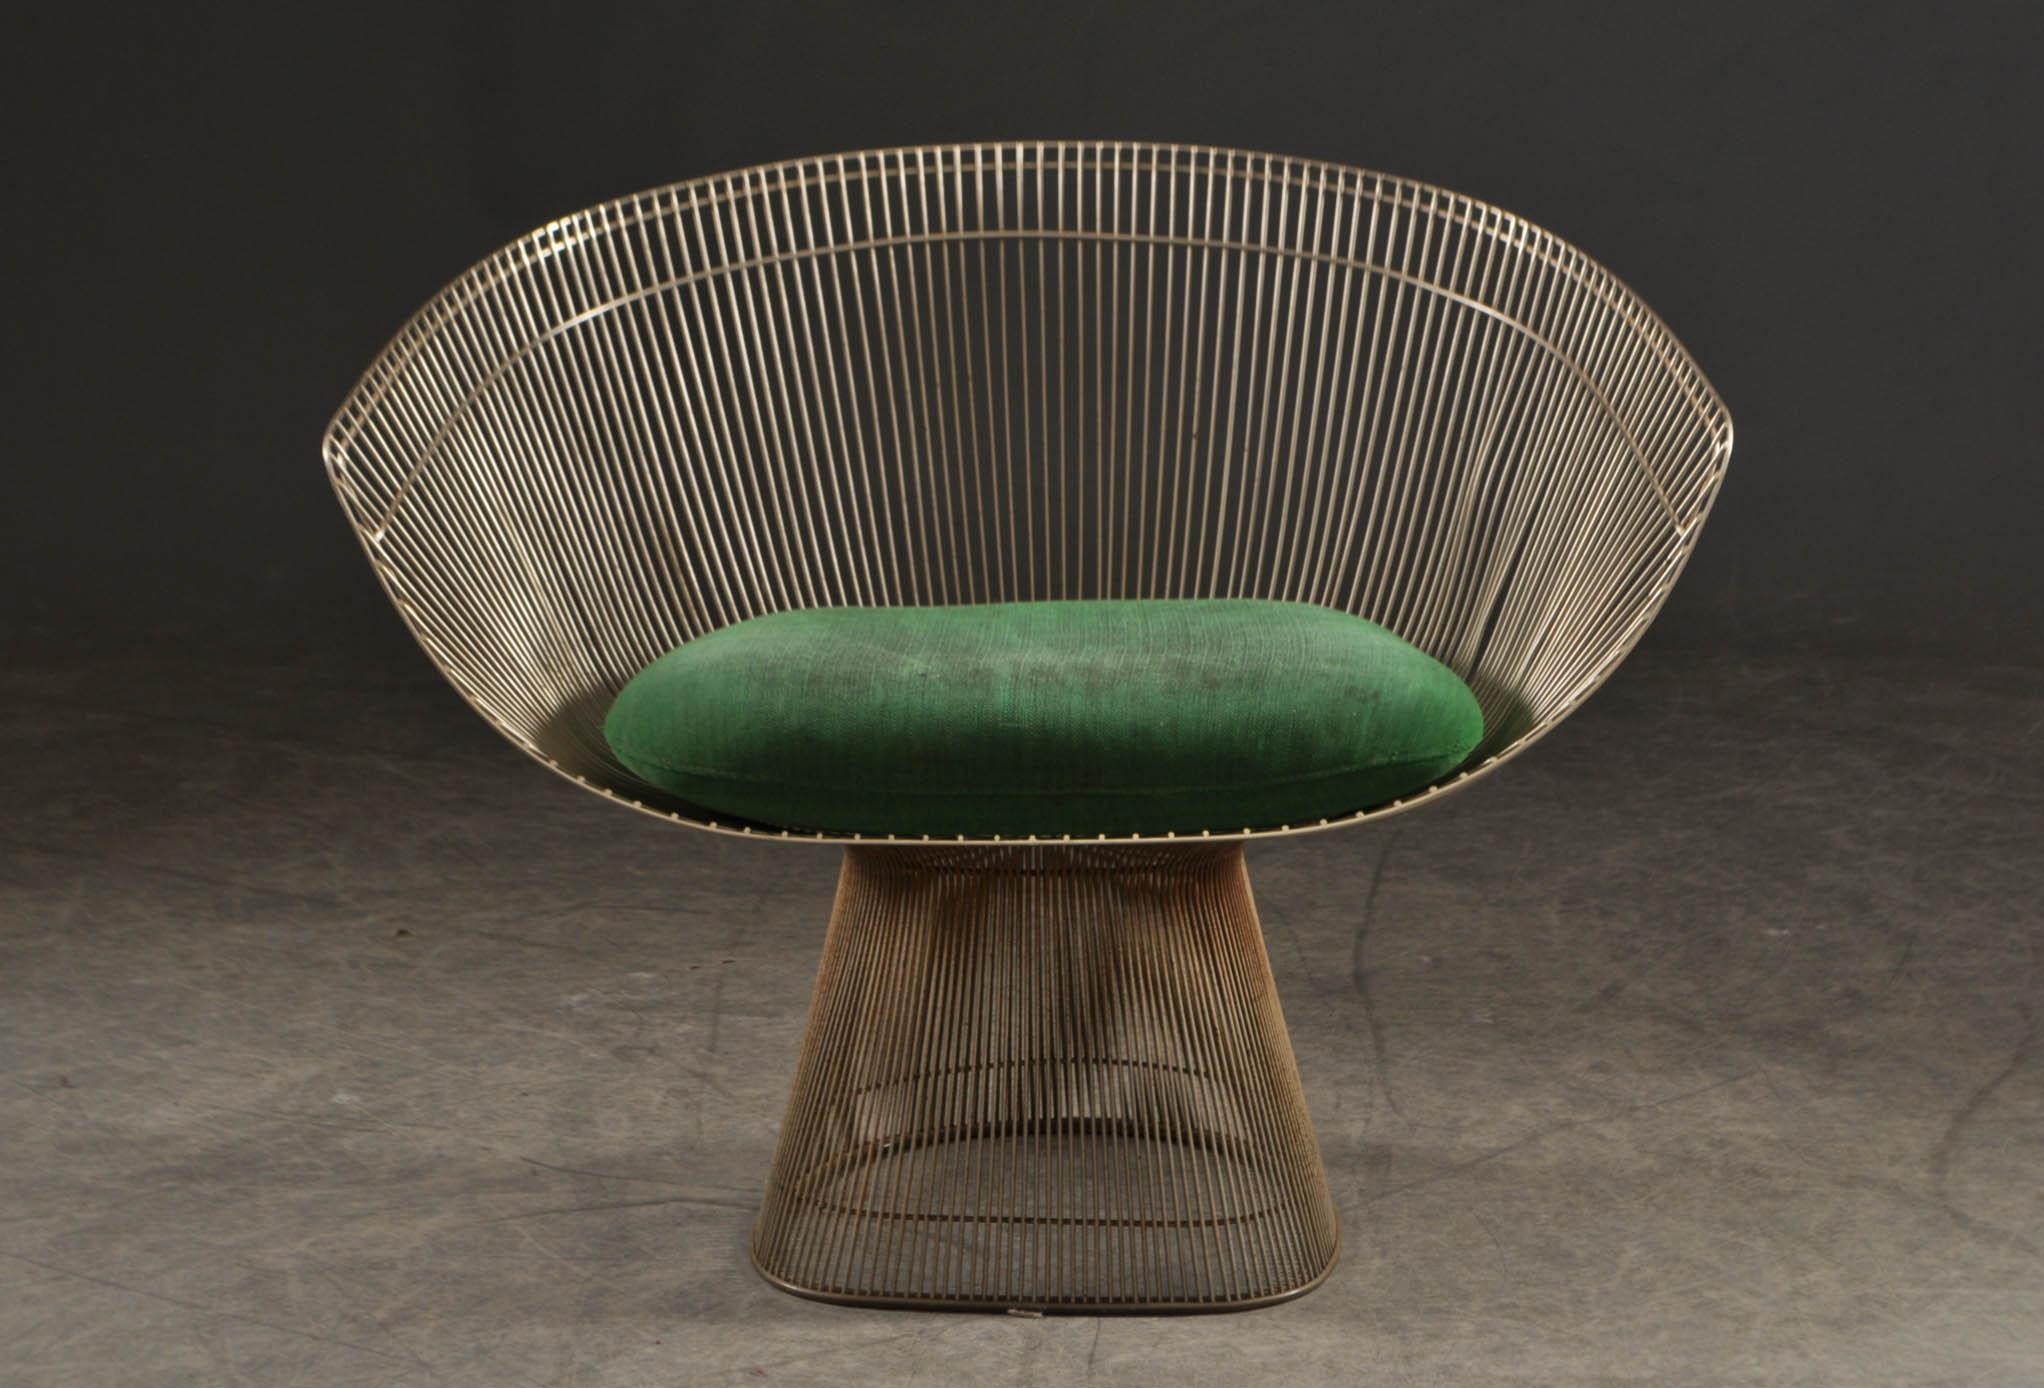 Warren Platner, Lounge Chair